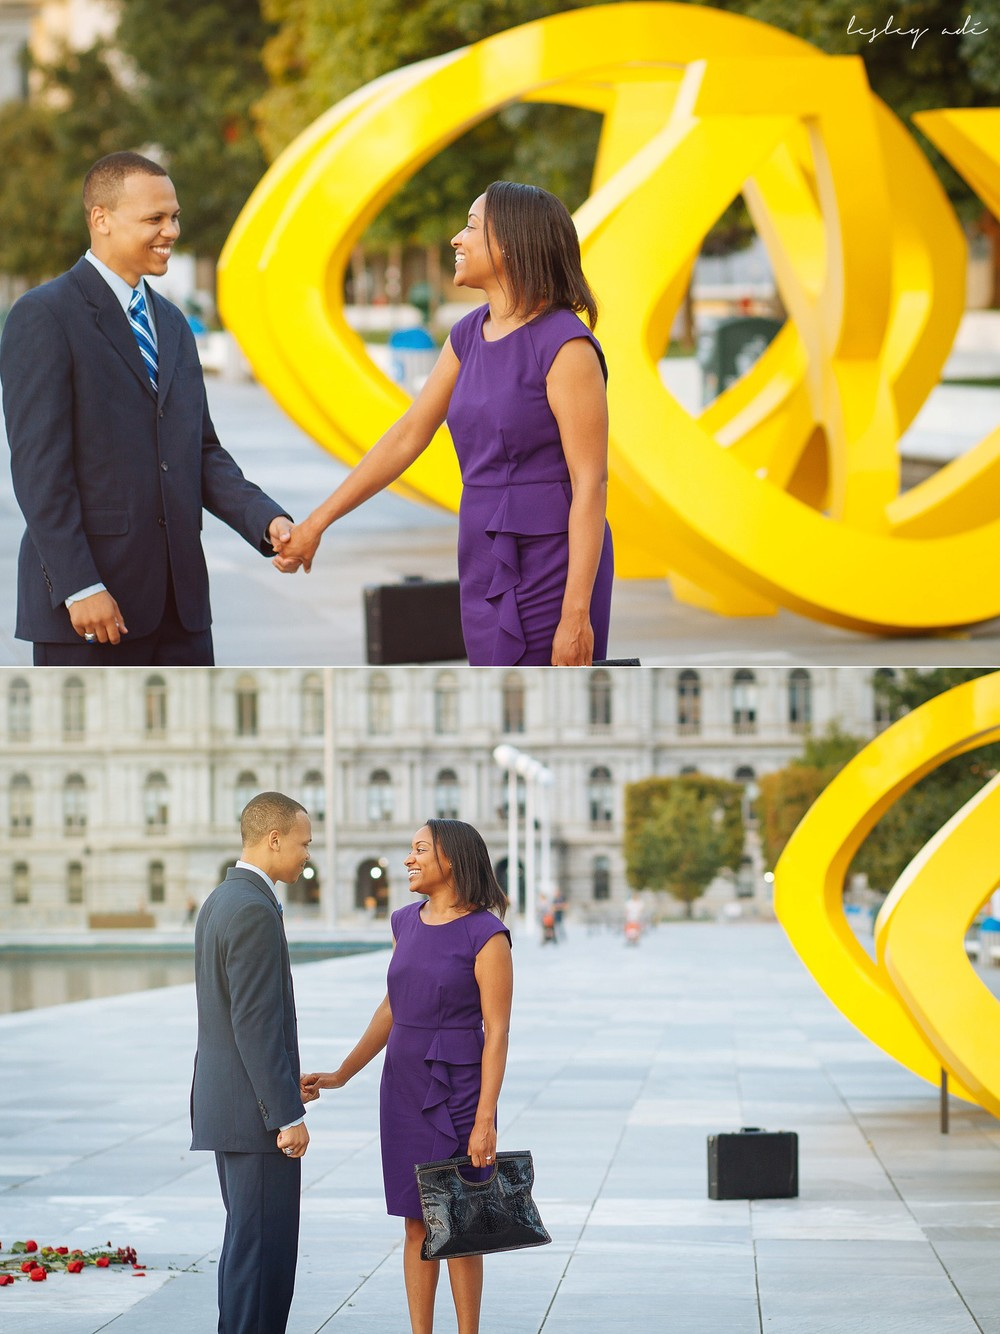 albany-proposal-engagement-new york-photographer-30.jpg